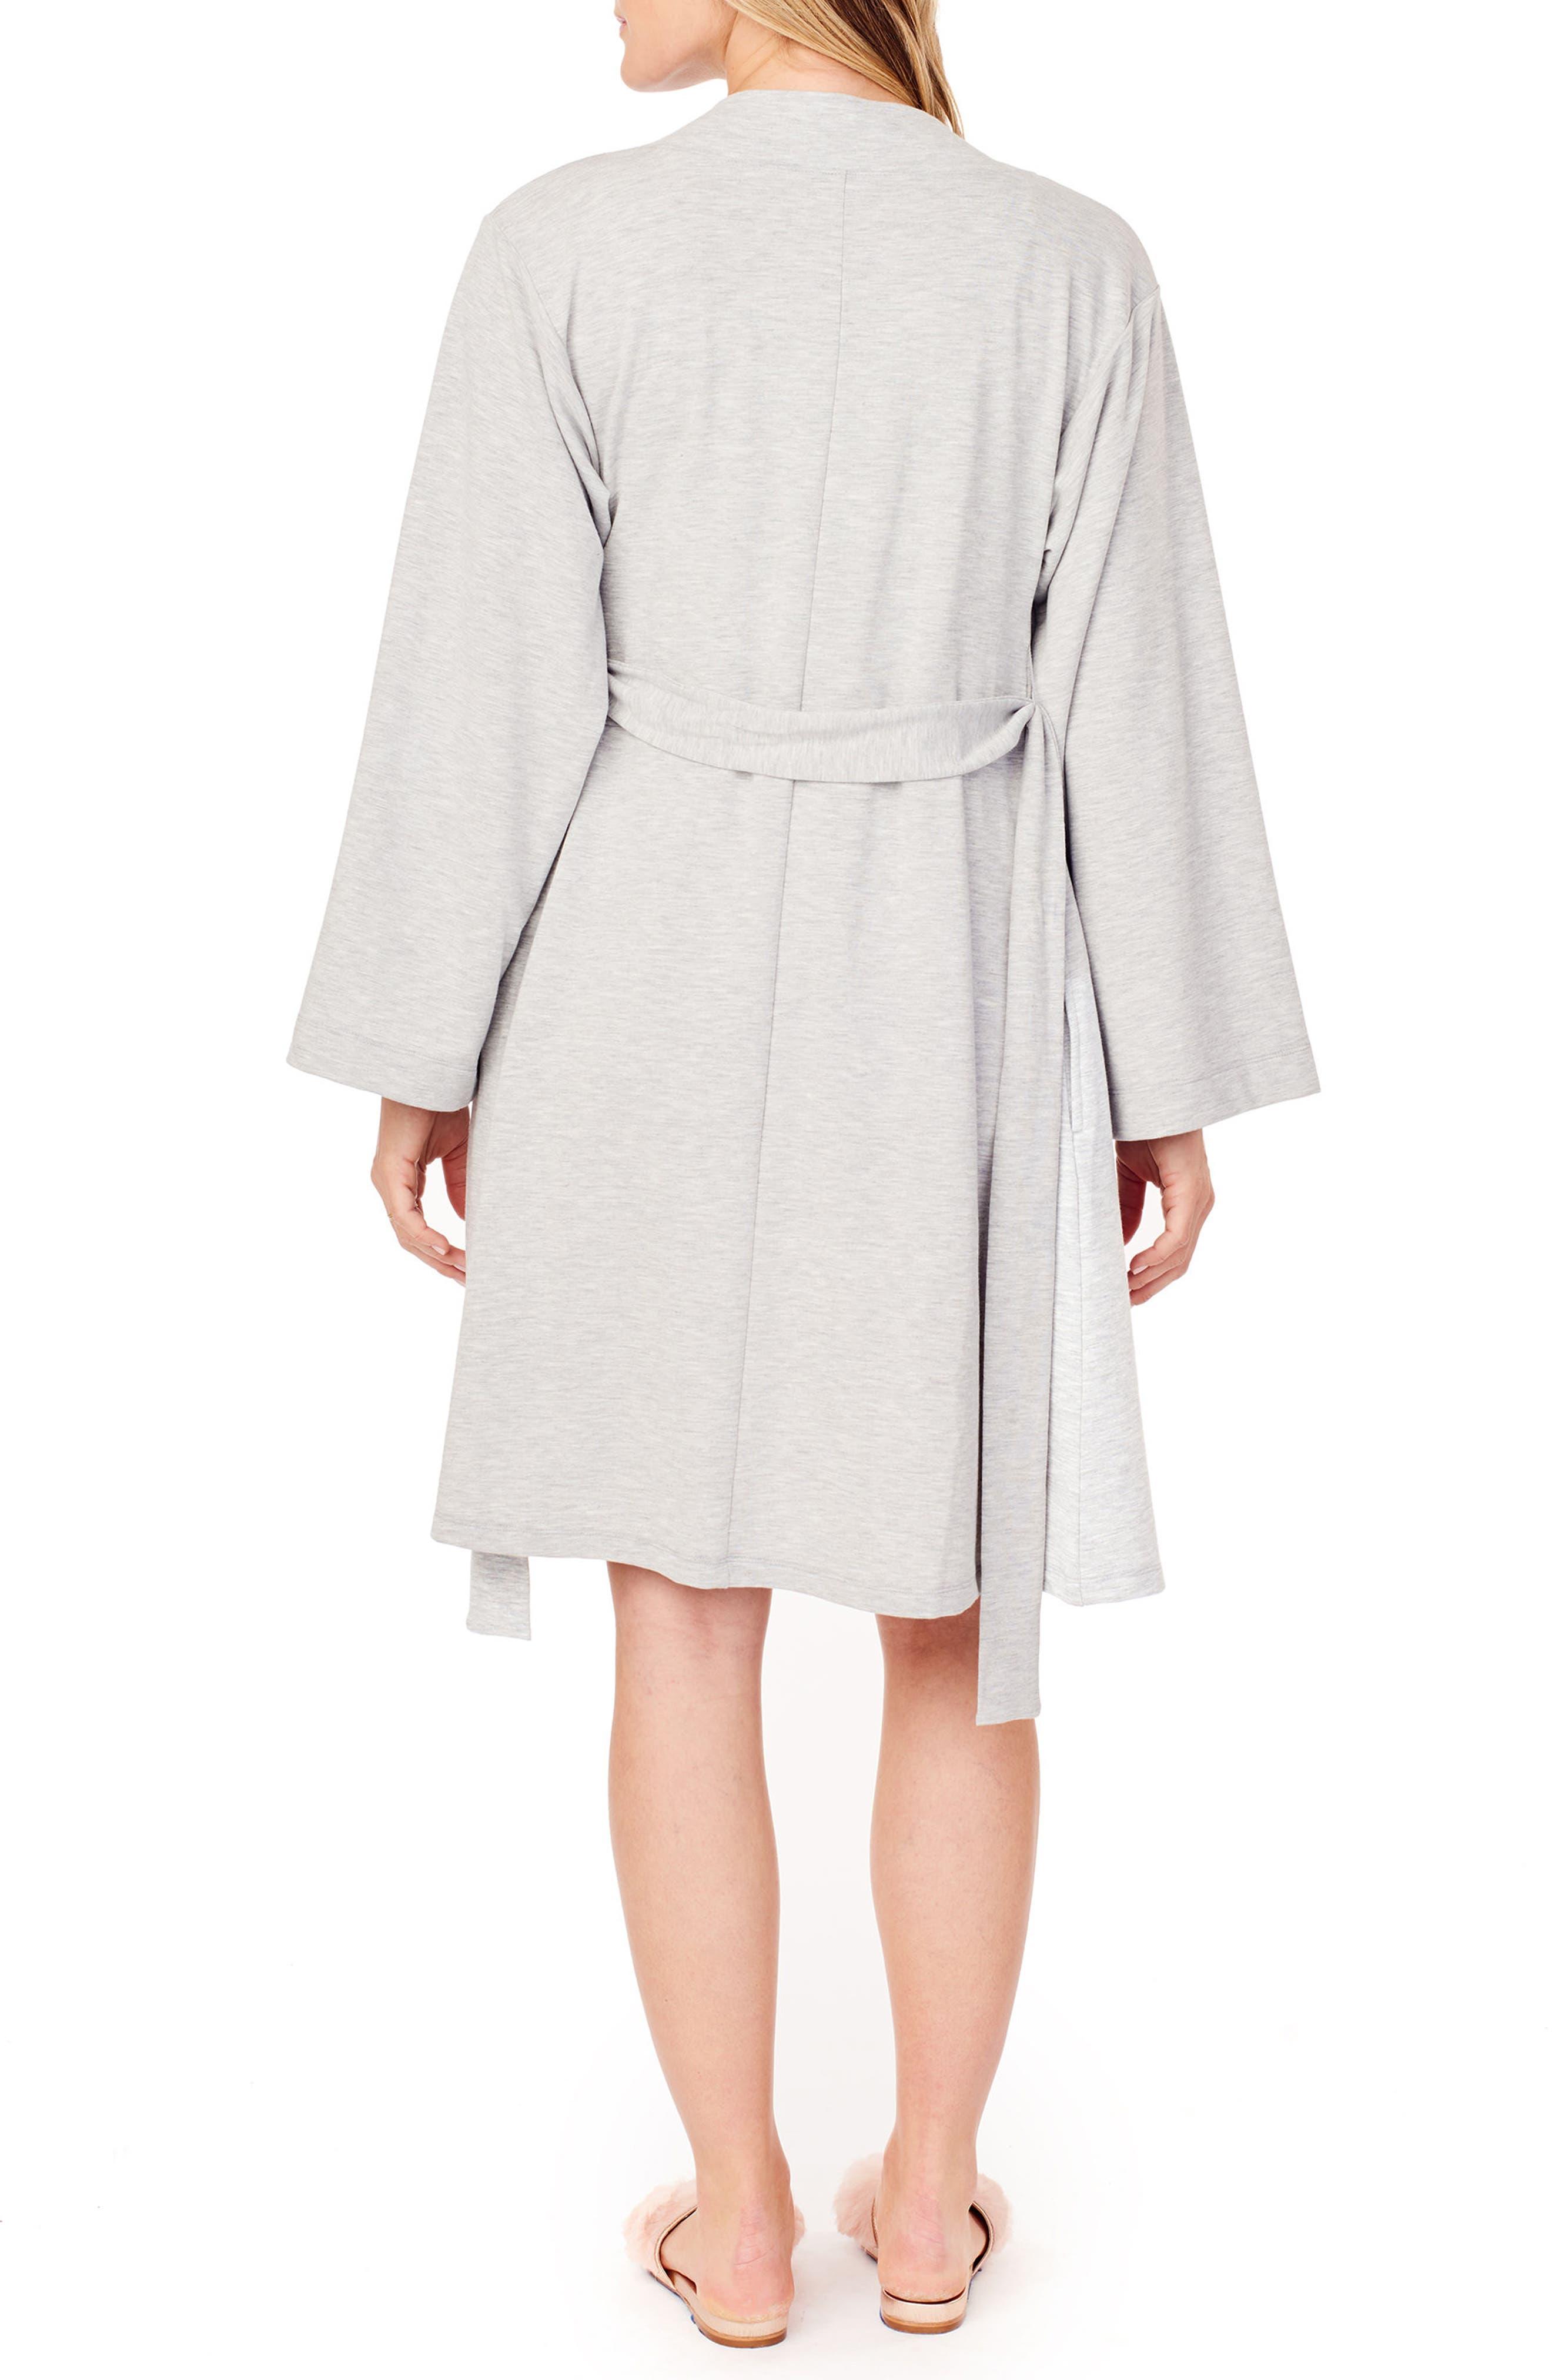 INGRID & ISABEL<SUP>®</SUP>, Kimono Lounge Maternity Robe, Alternate thumbnail 2, color, LIGHT HEATHER GREY